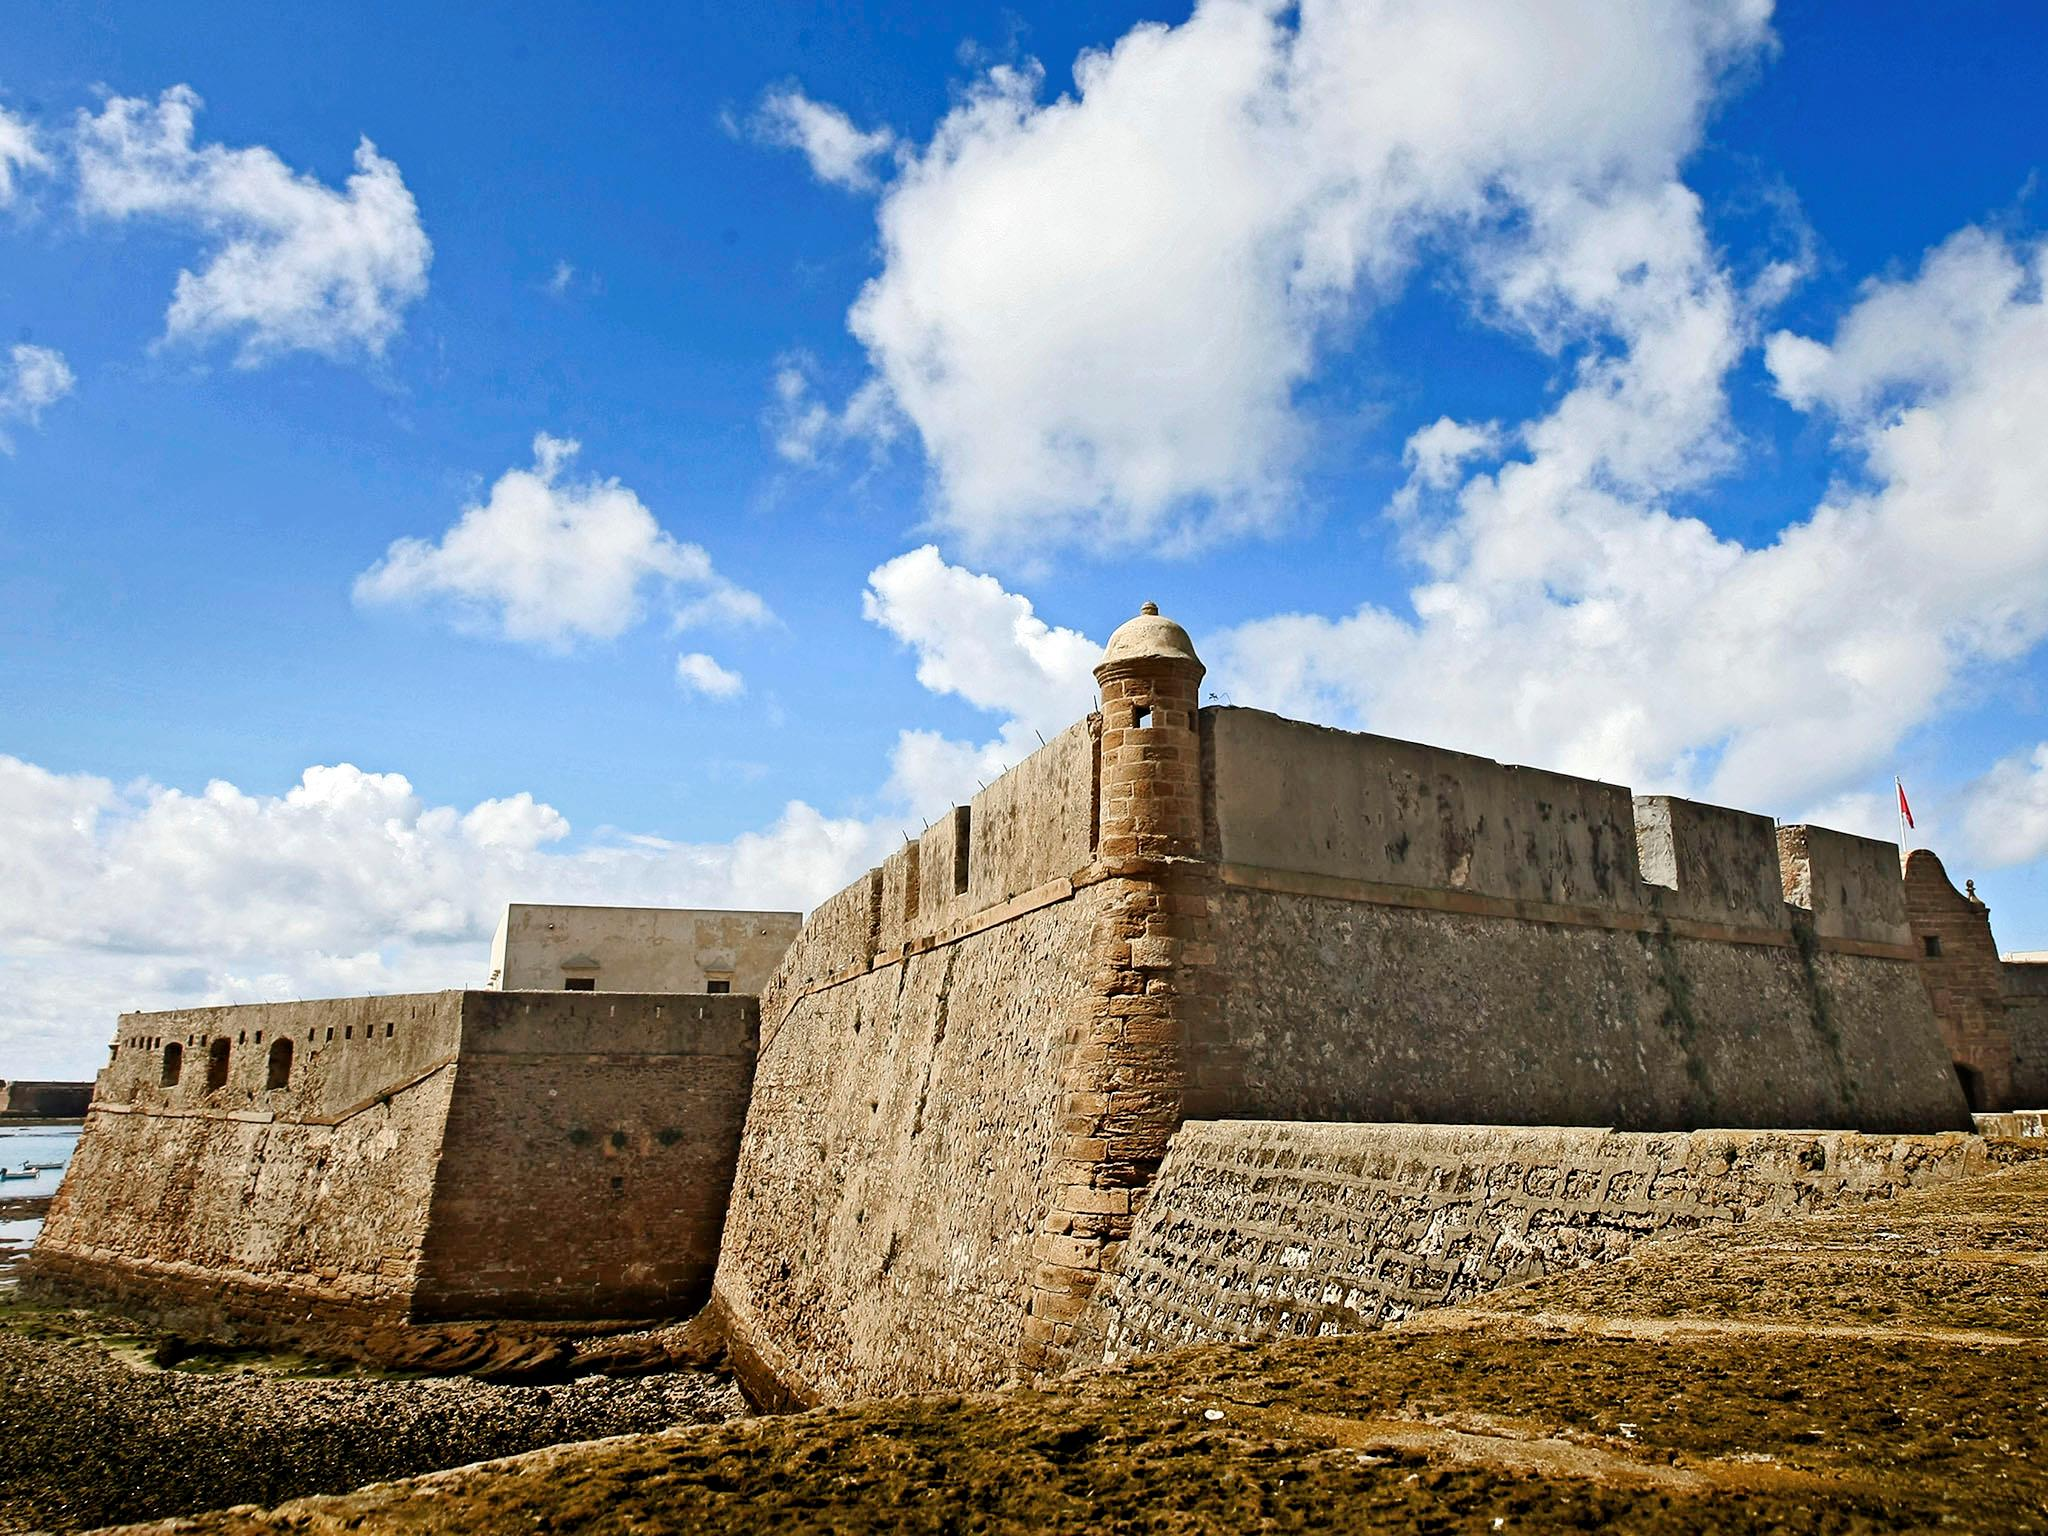 Tour-Castillos-y-Baluartes-de-Cadiz-16